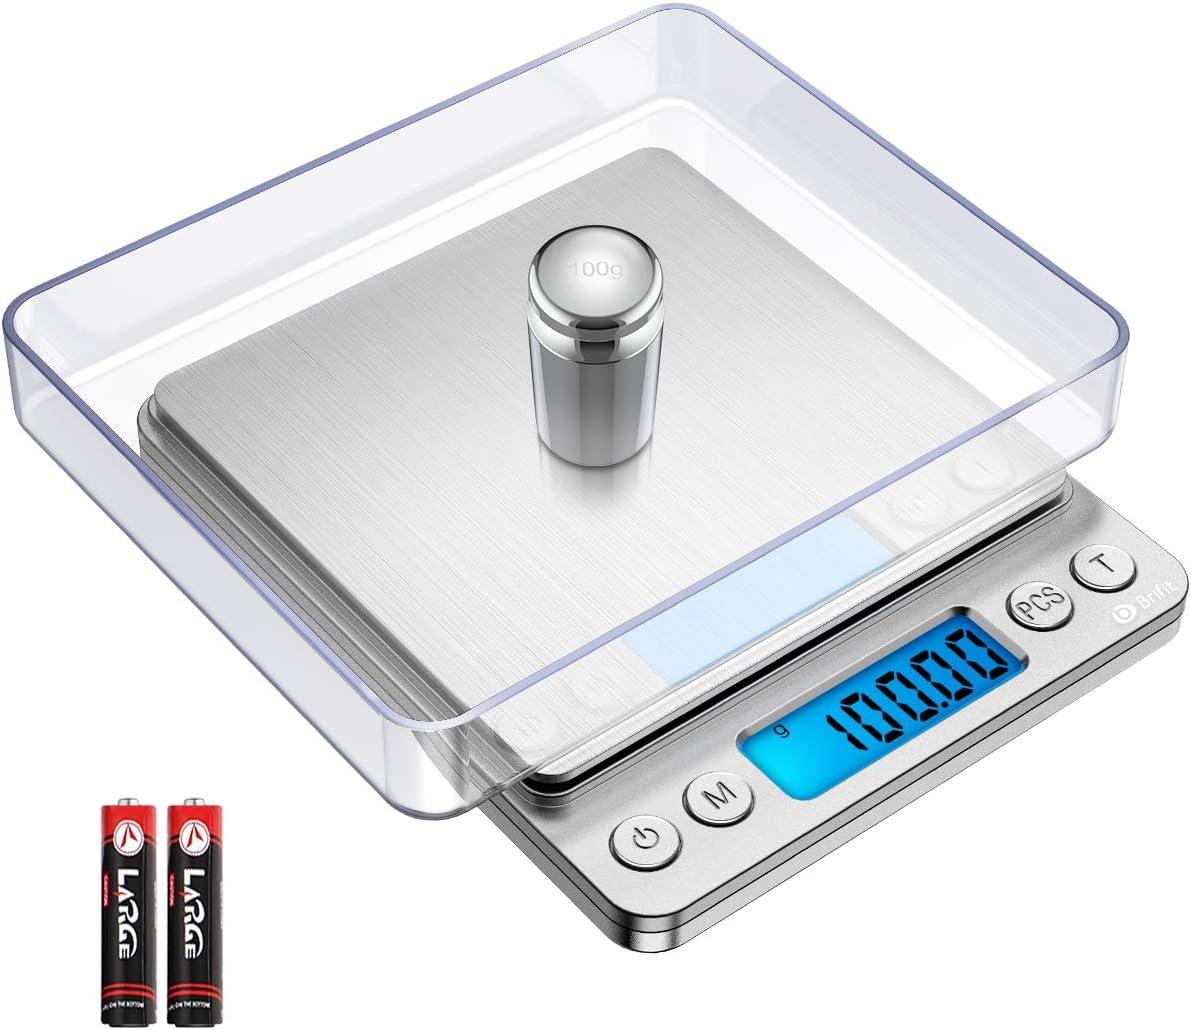 Criacr Báscula Digitales de Precisión, 500g/ 0.01g Bascula Cocina Digital con 100g de Peso, Balanza de Alimentos Multifuncional con Pantalla LCD Retroiluminada, Función de Tara y PCS